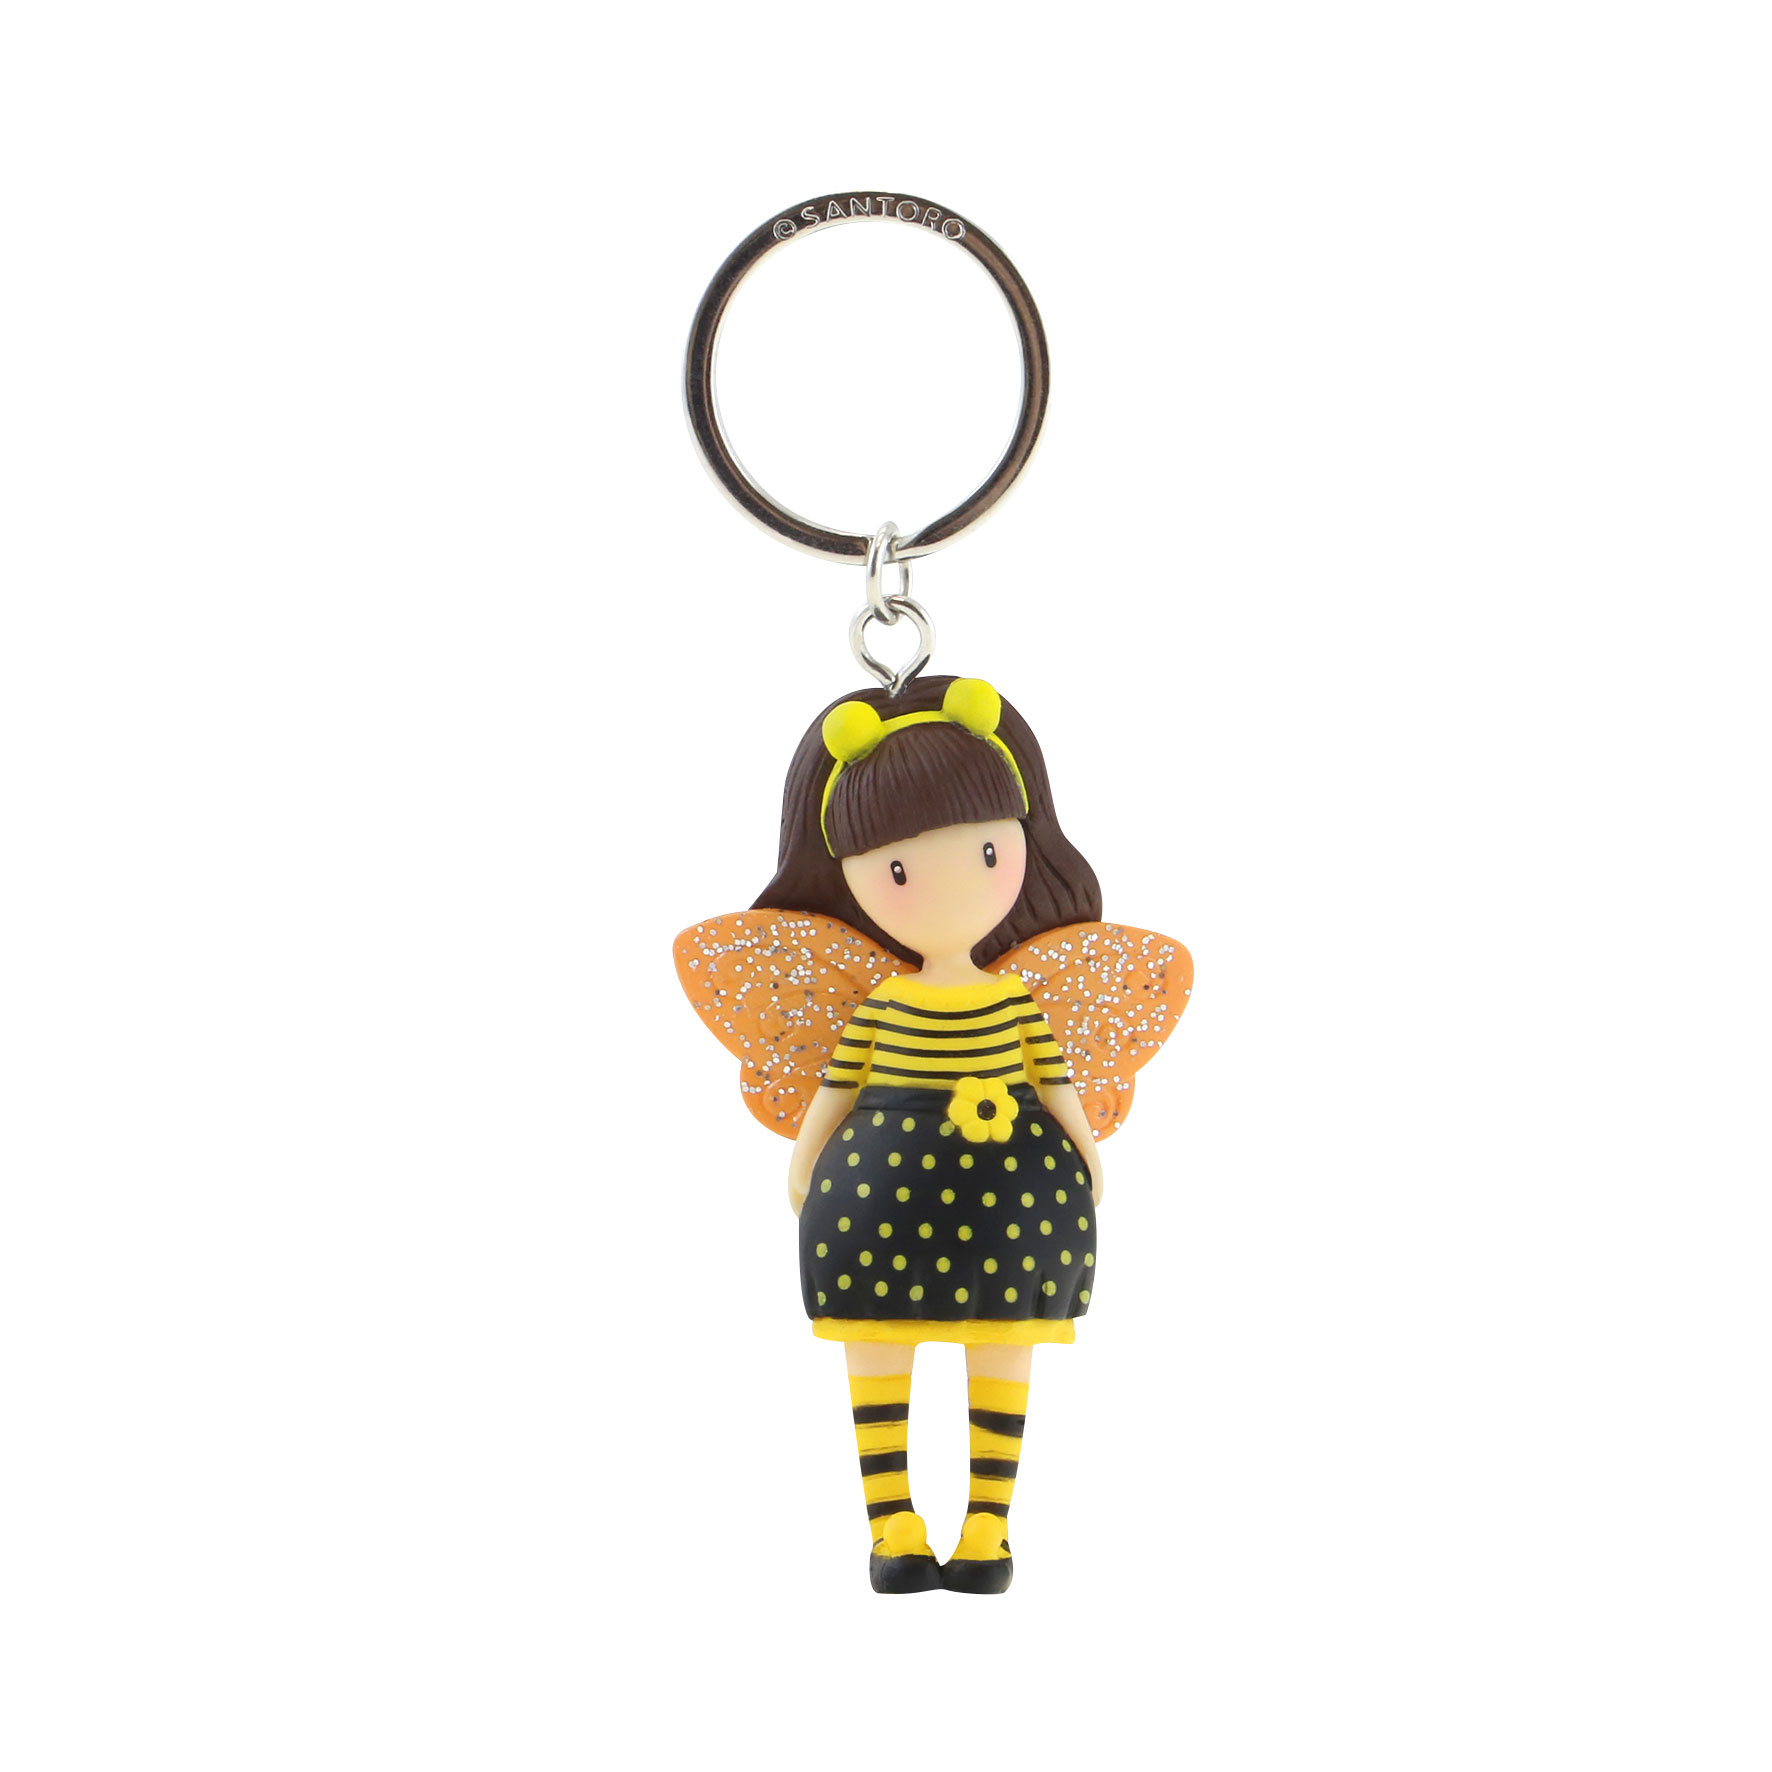 Felt Tip Colour Change Pens Santoro Gorjuss Bee Loved Tall Tails Oops a Daisy